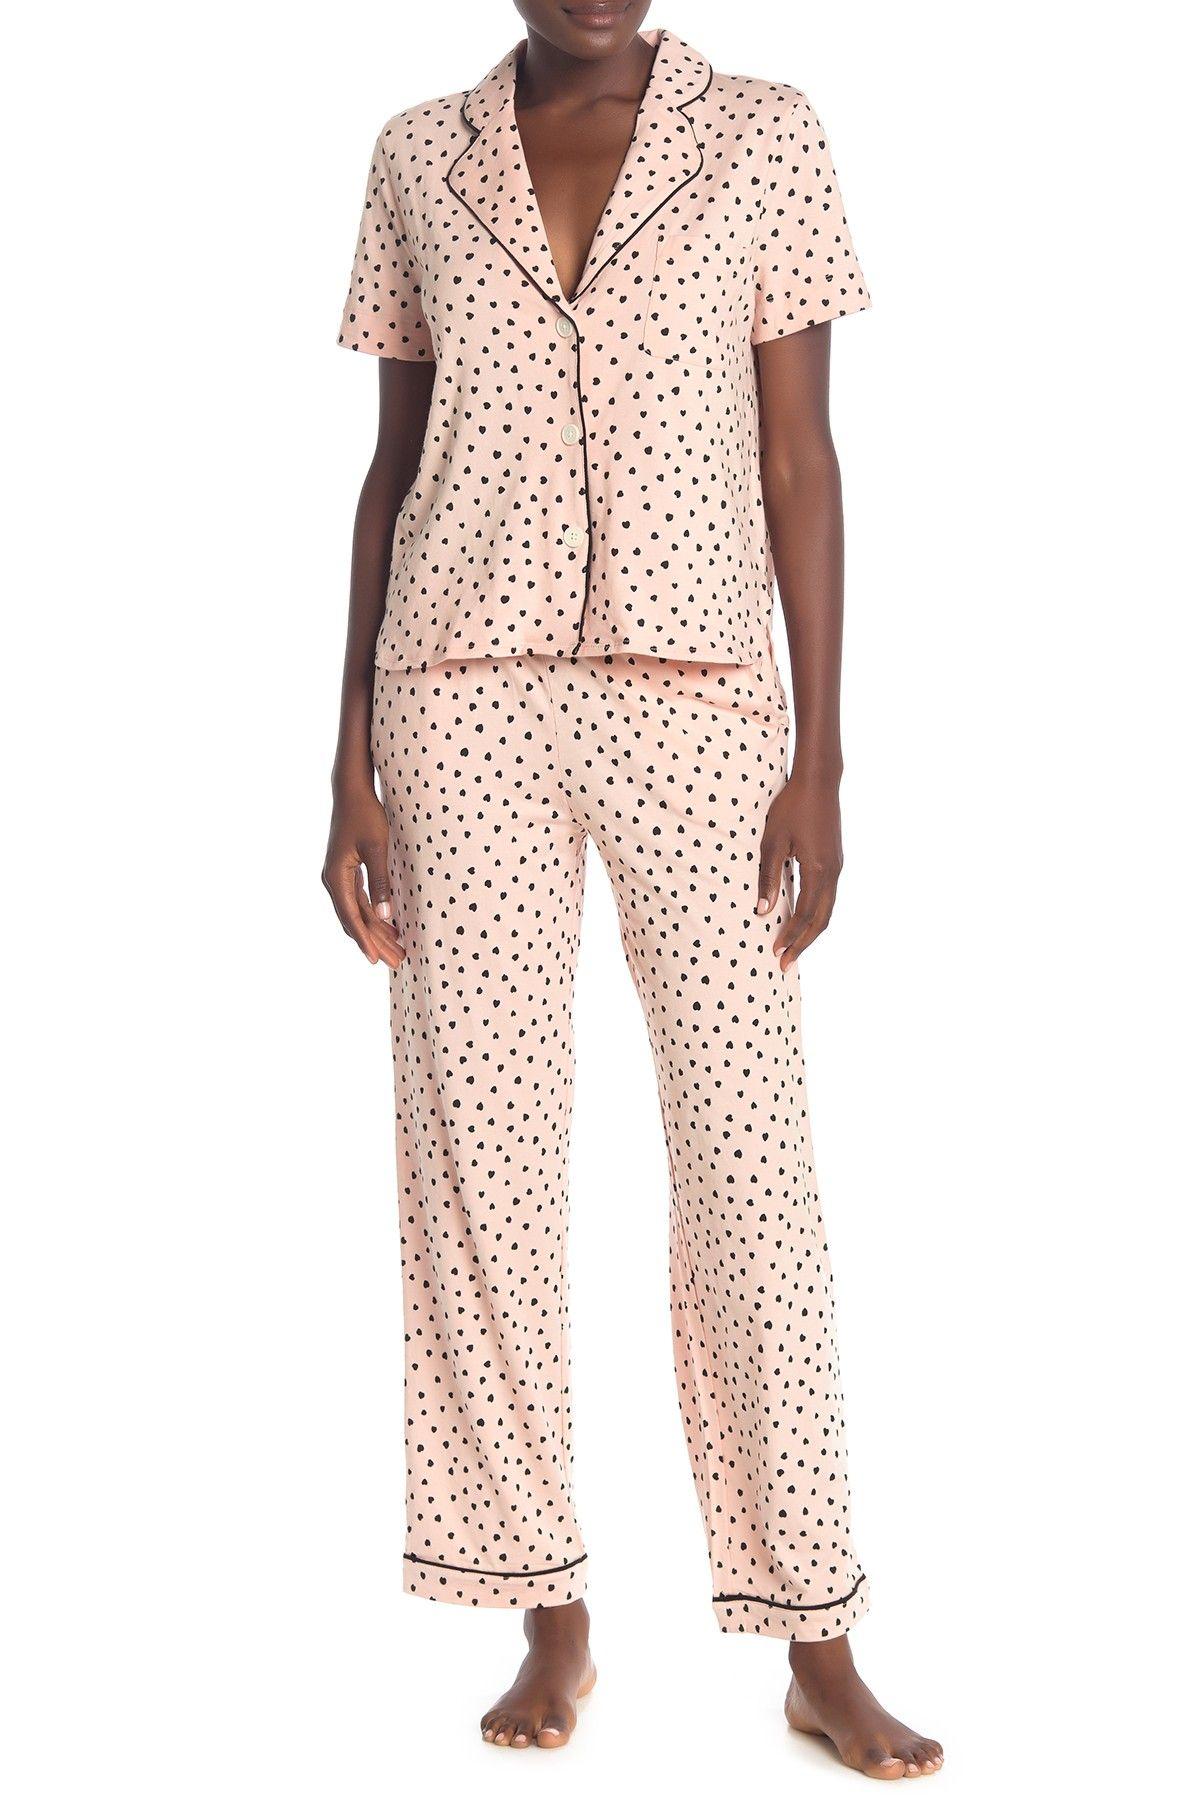 Madewell | Bedtime Heart Print Top & Pants Pajama 2-Piece Set #nordstromrack